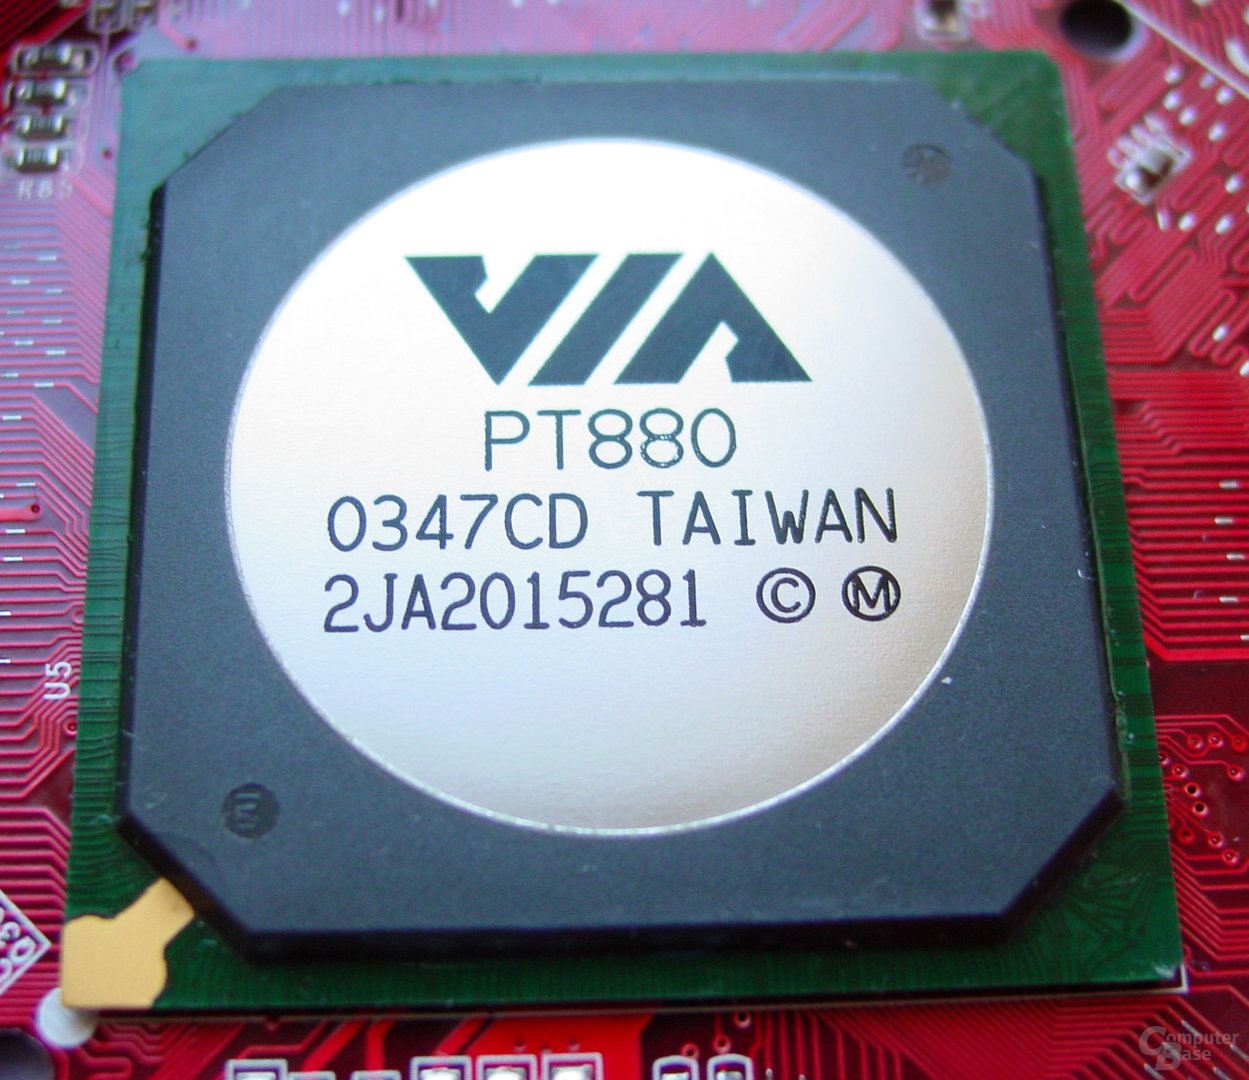 MSI PT880 Neo-LSR - VIA PT880